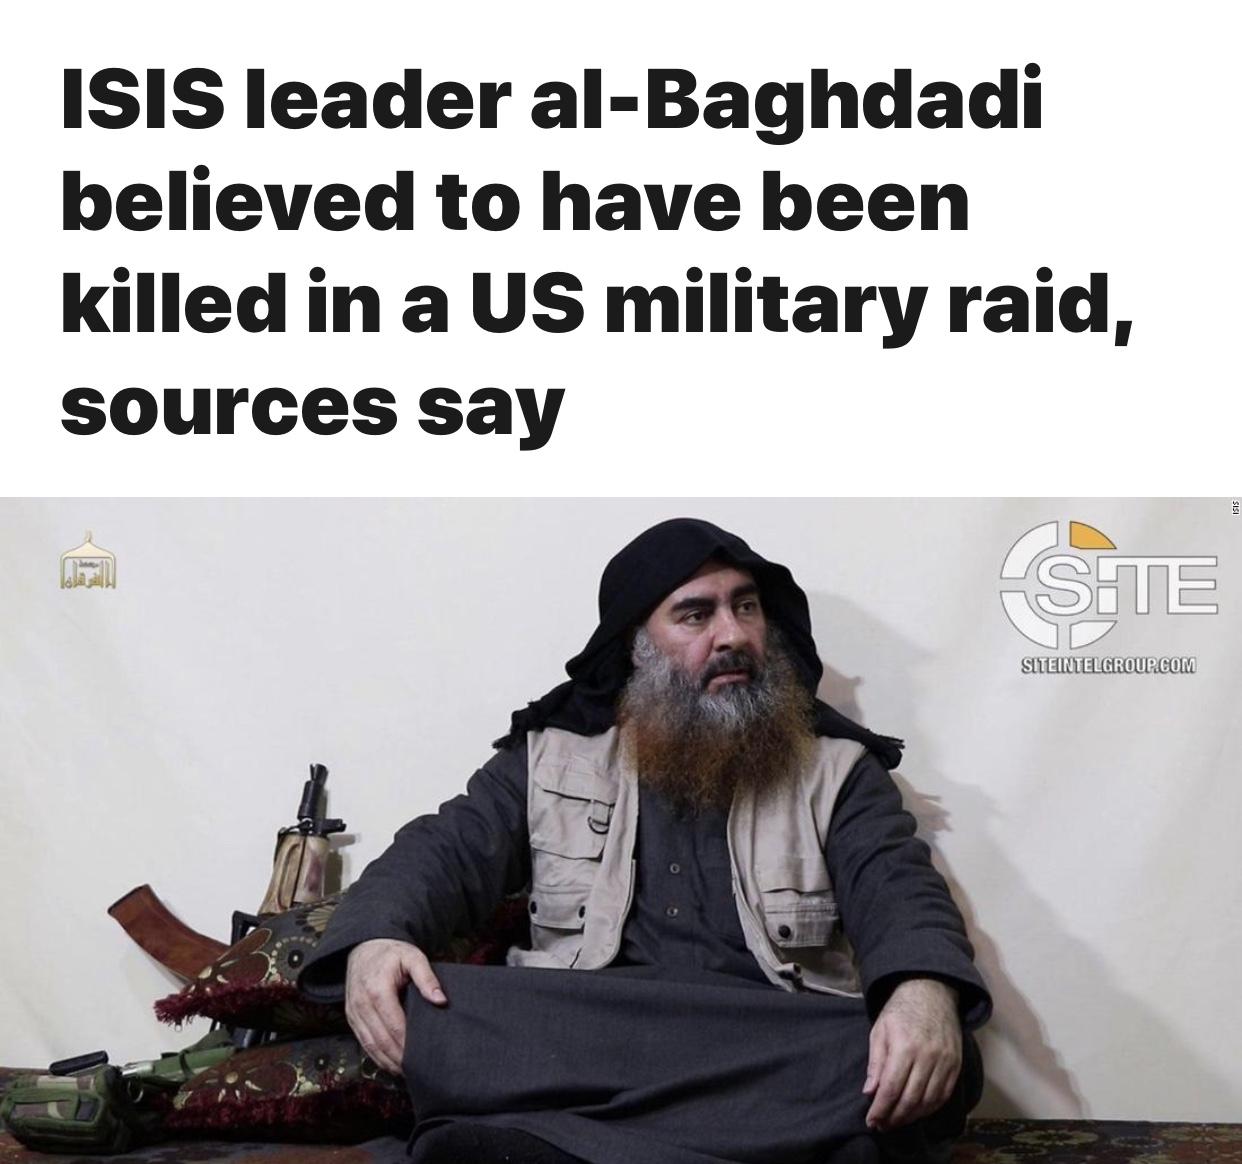 ISIS leader Abu Bakr al-Baghdadi believed to have been killed in US military raid